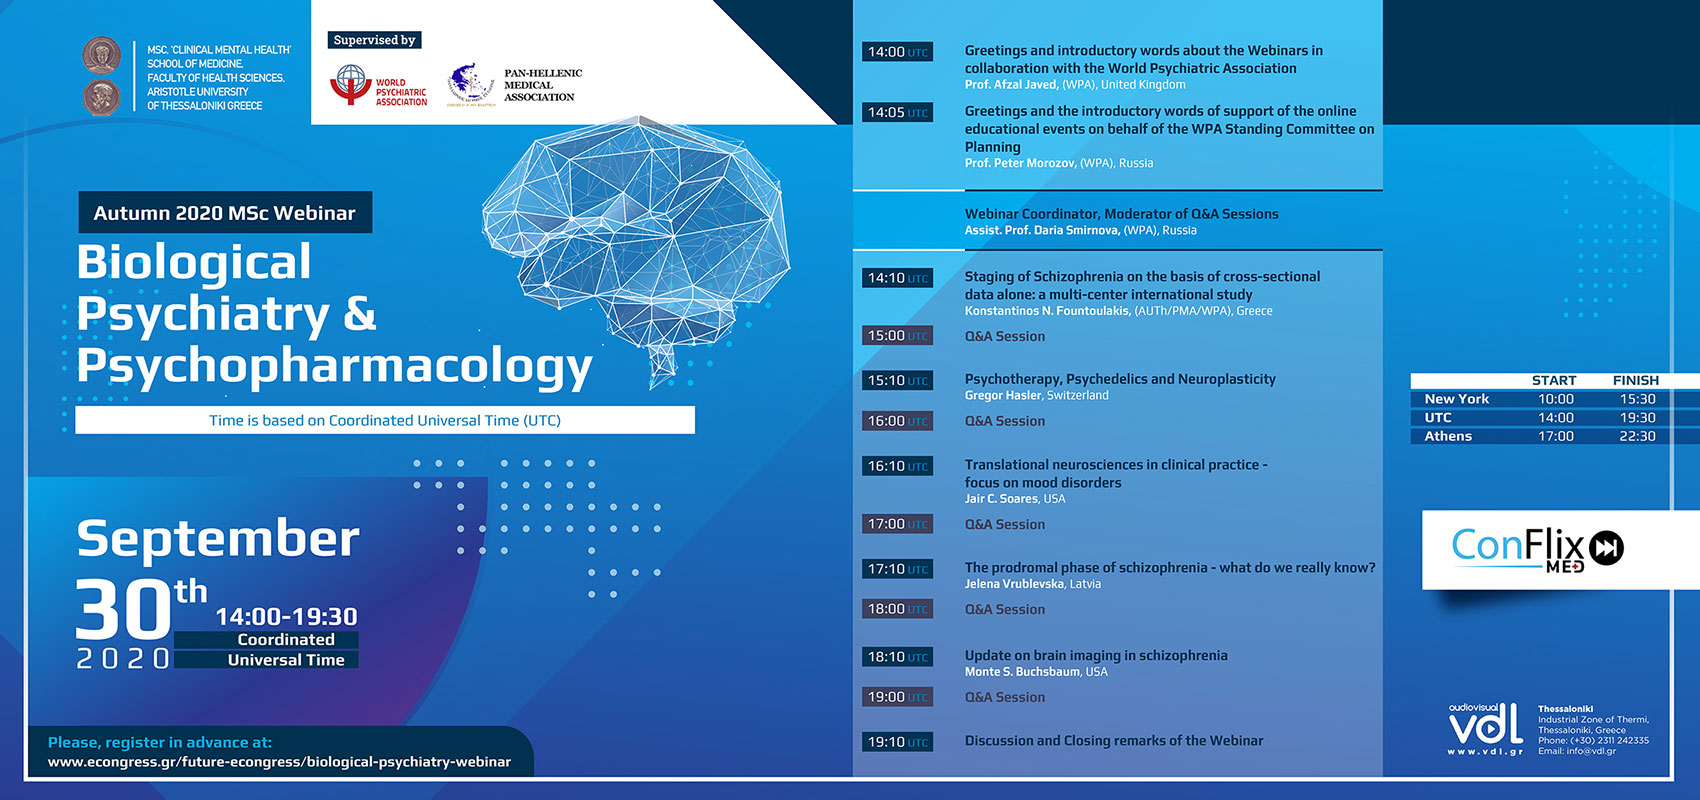 Autumn 2020 MSc Webinar - Biological Psychiatry & Psychopharmacology